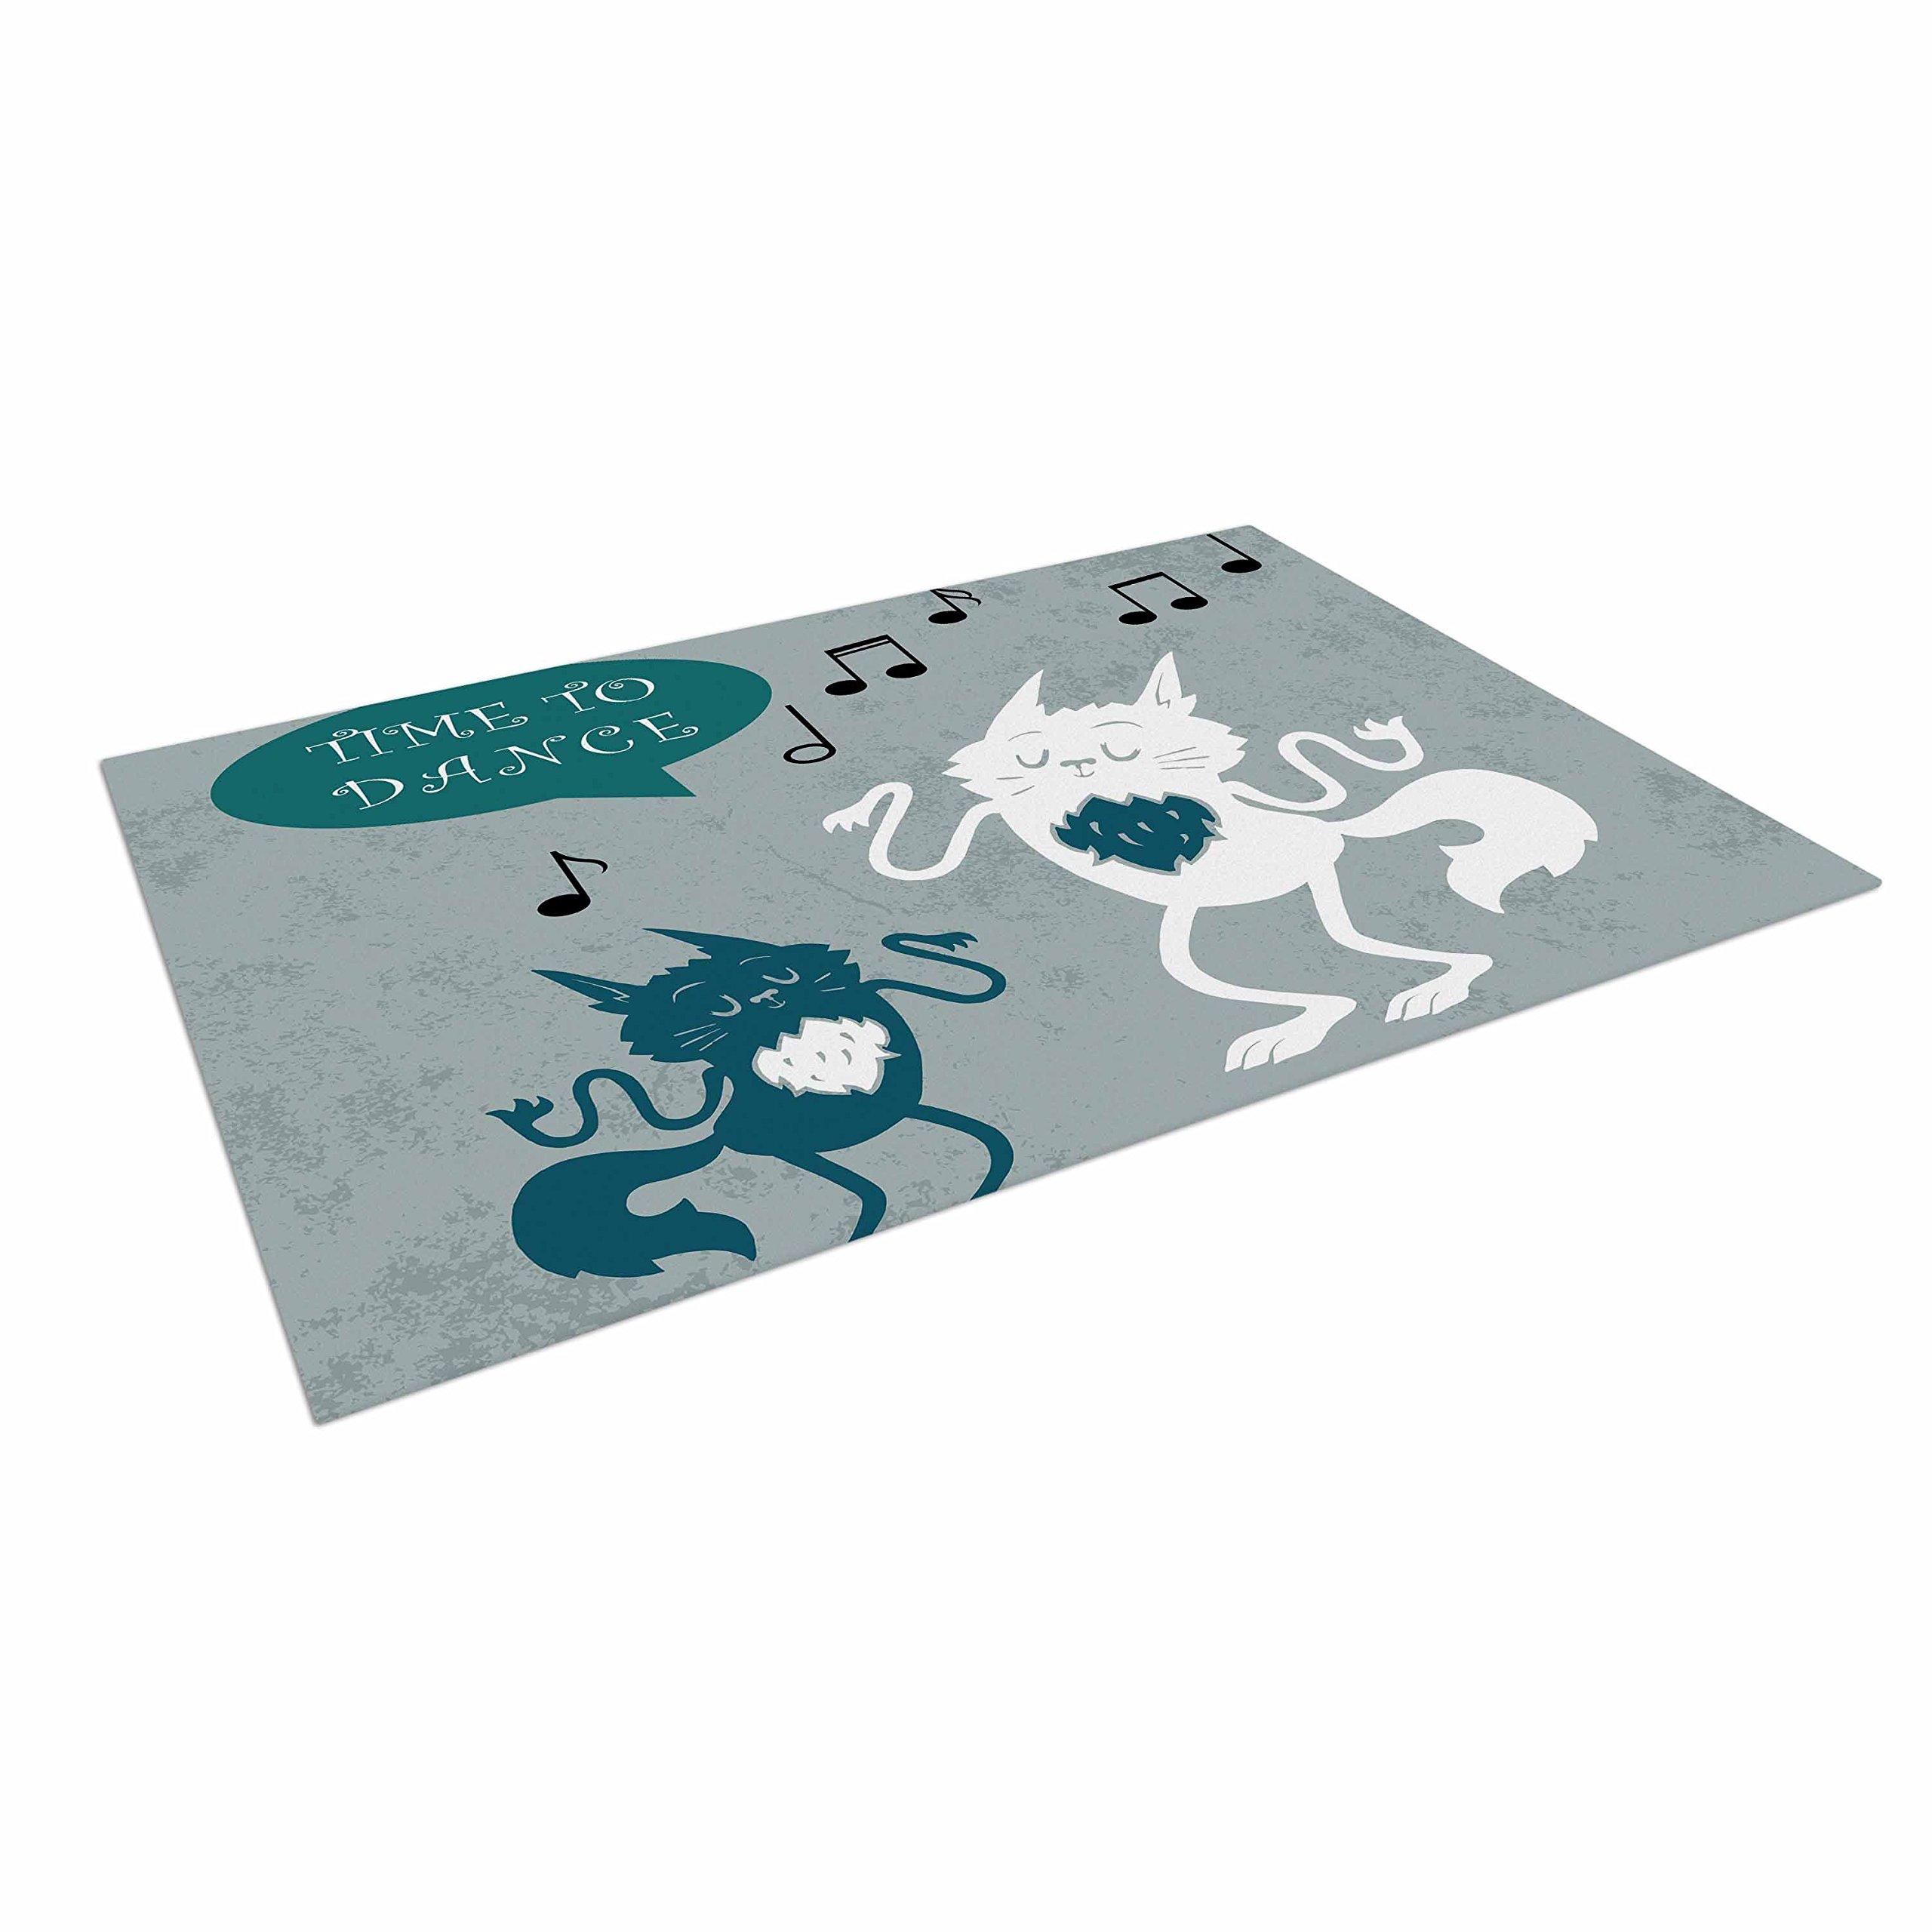 KESS InHouse Anya Volk ''Time To Dance'' Green White Outdoor Floor Mat, 4' x 5'